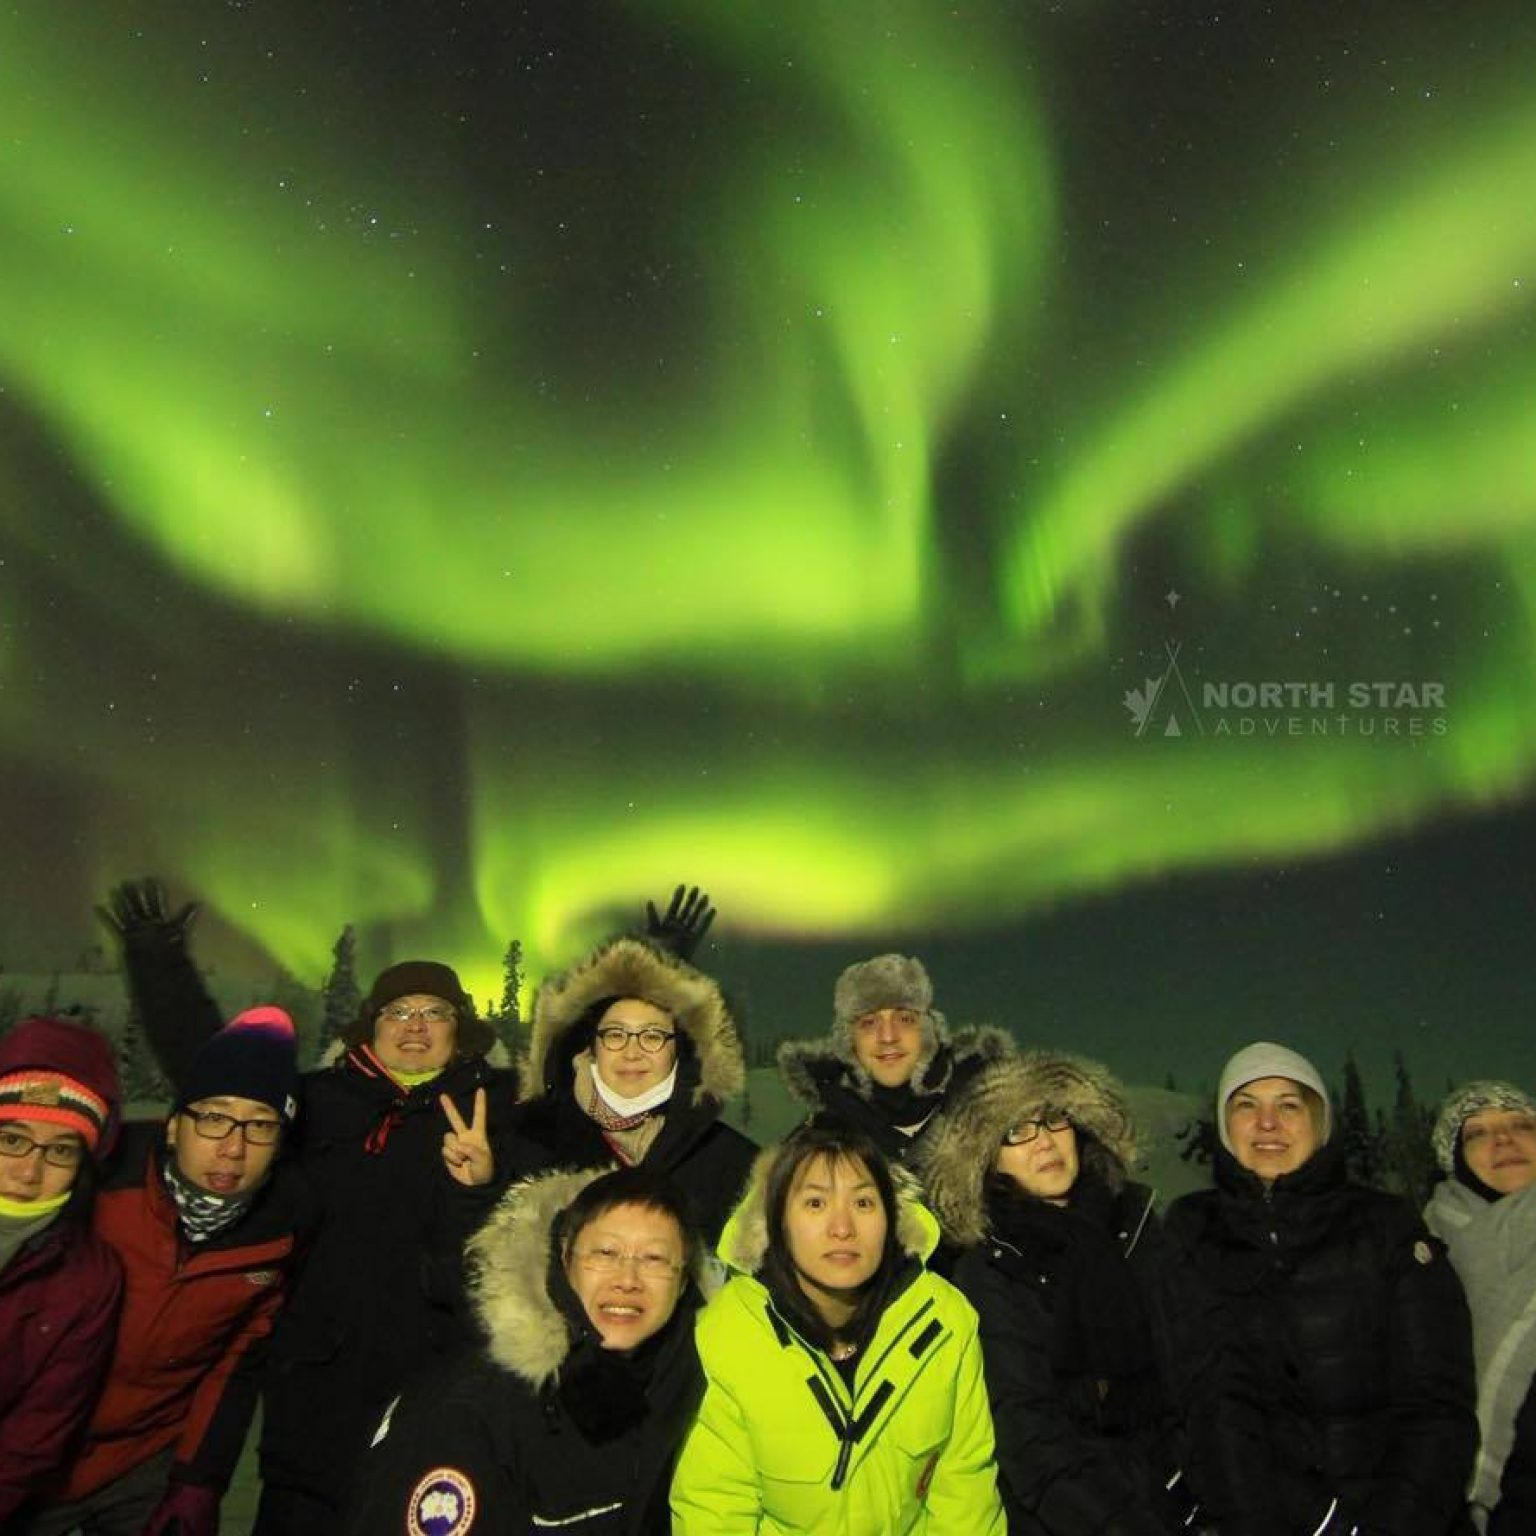 North Star Adventures - Aurora Hunting Tour